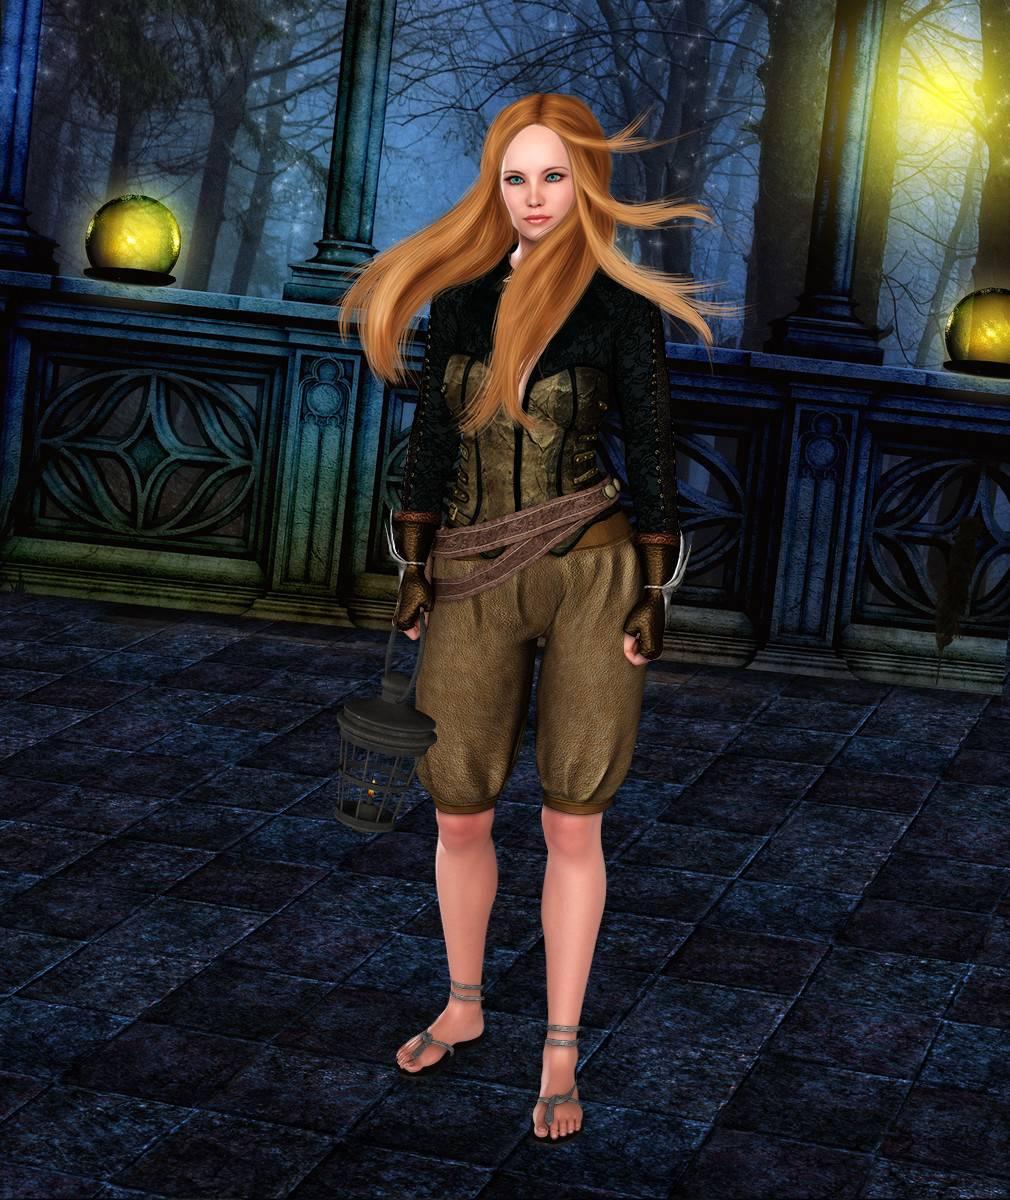 ePic Character Generator Season 2 Female Adventurer 1 Screenshot 15